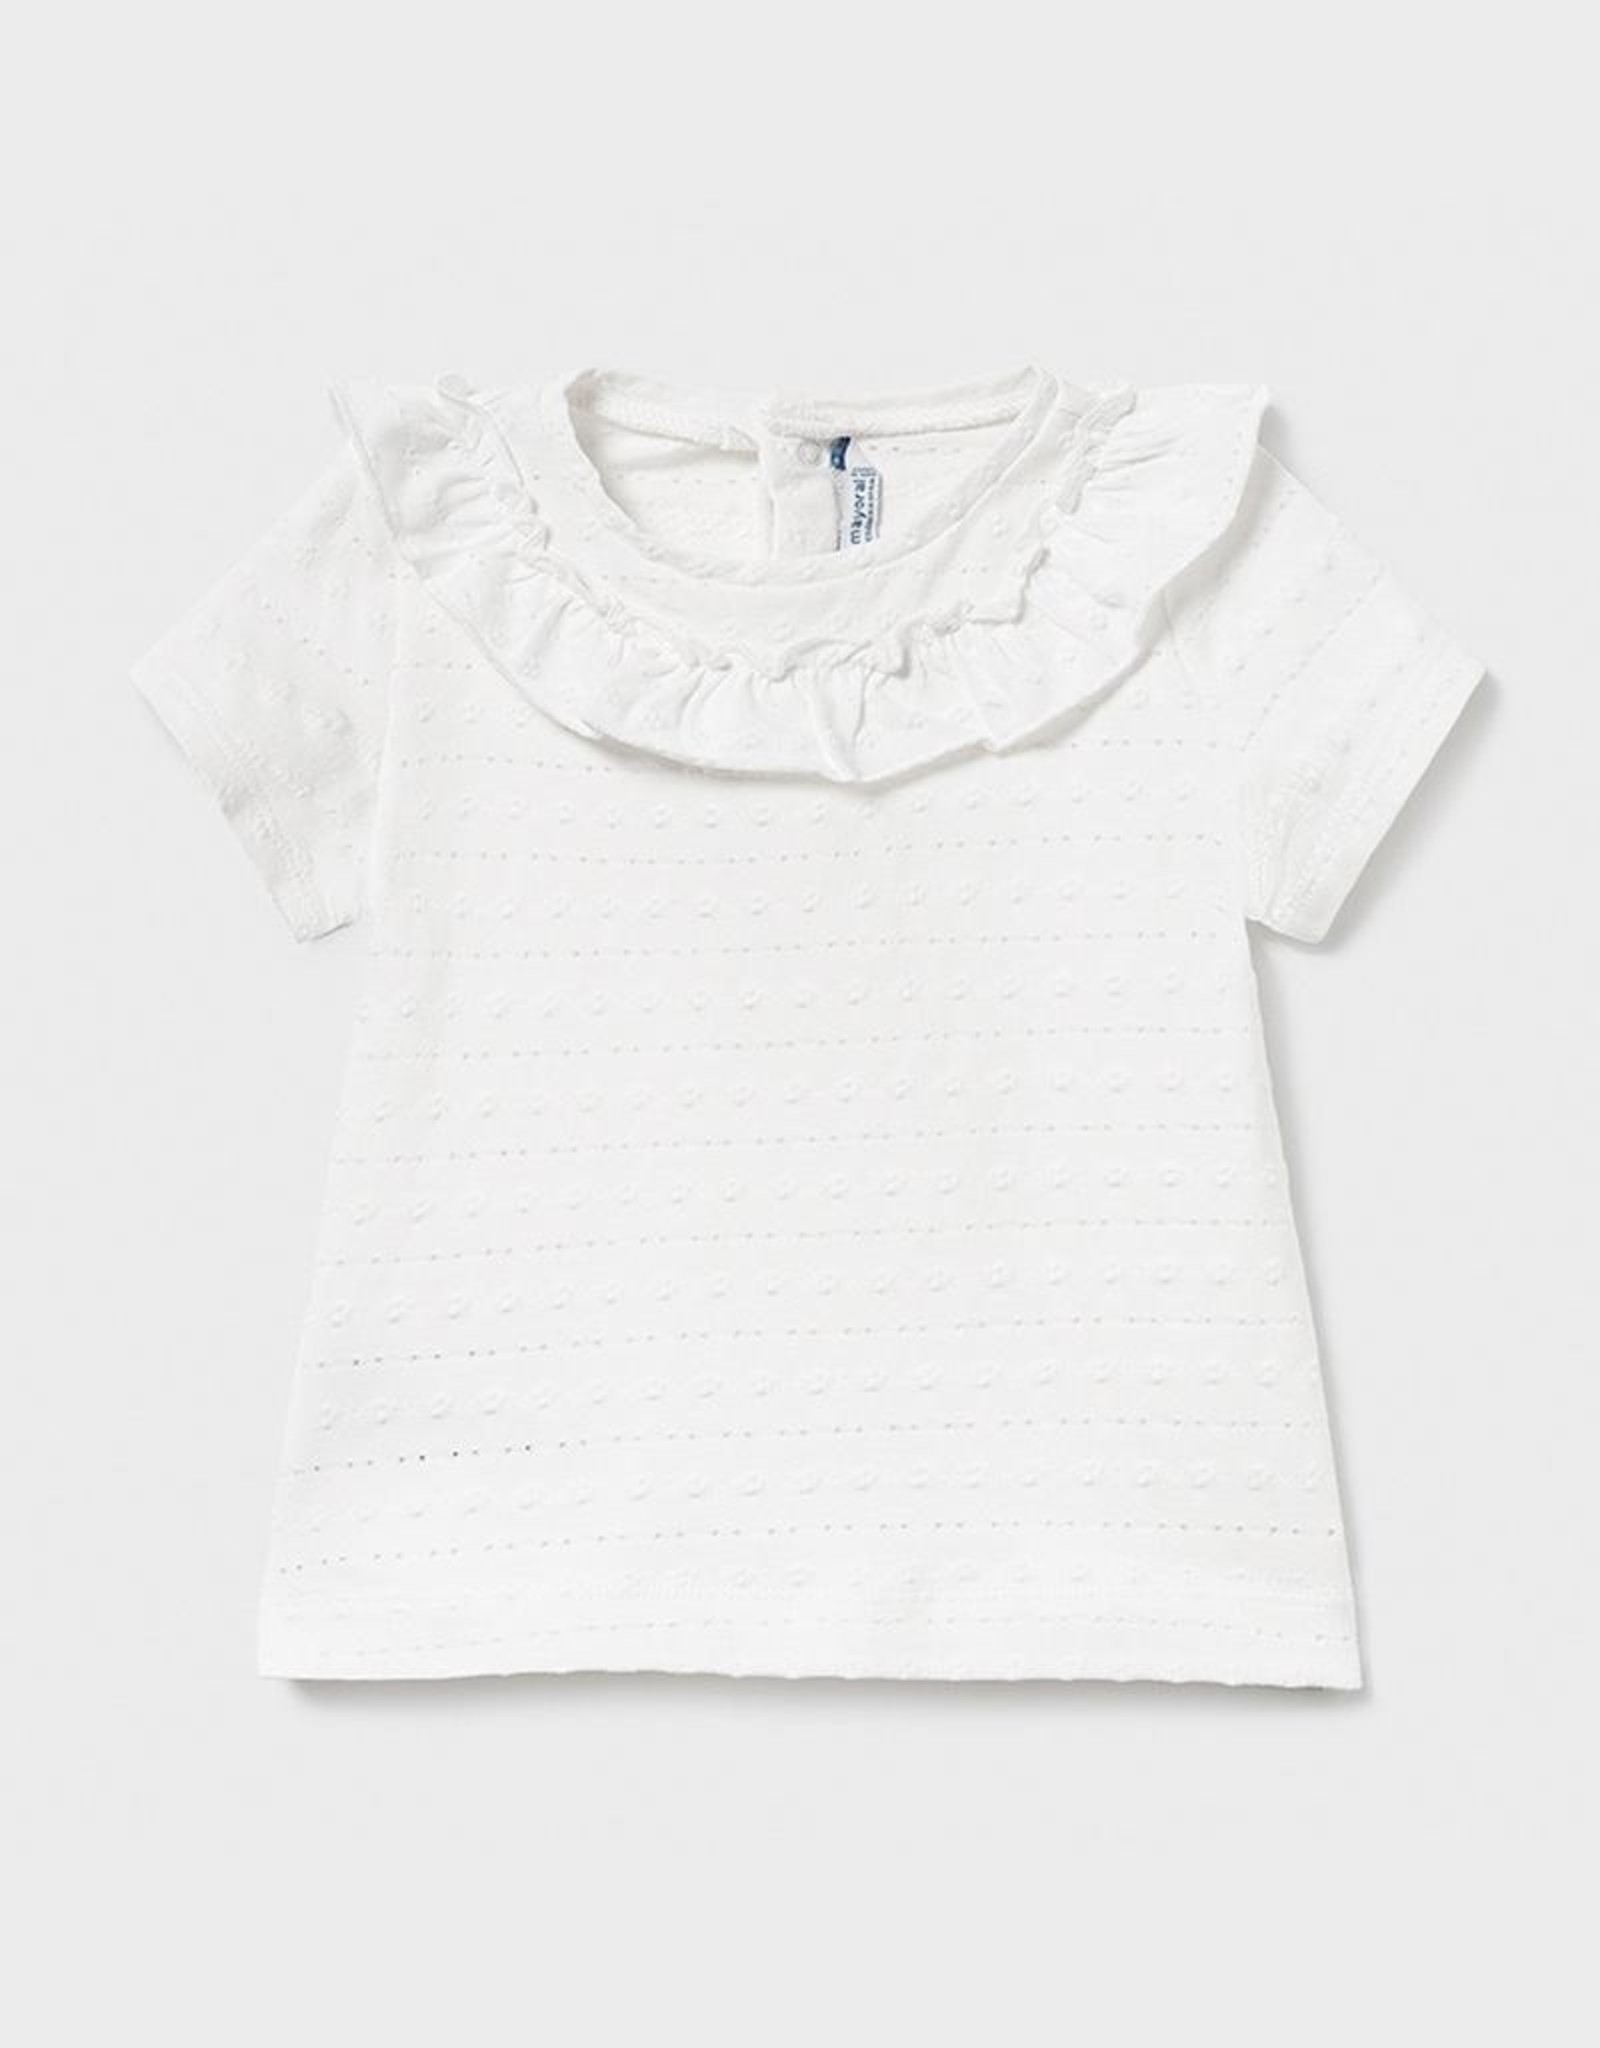 Mayoral Off White Ruffled Collar Baby T-Shirt